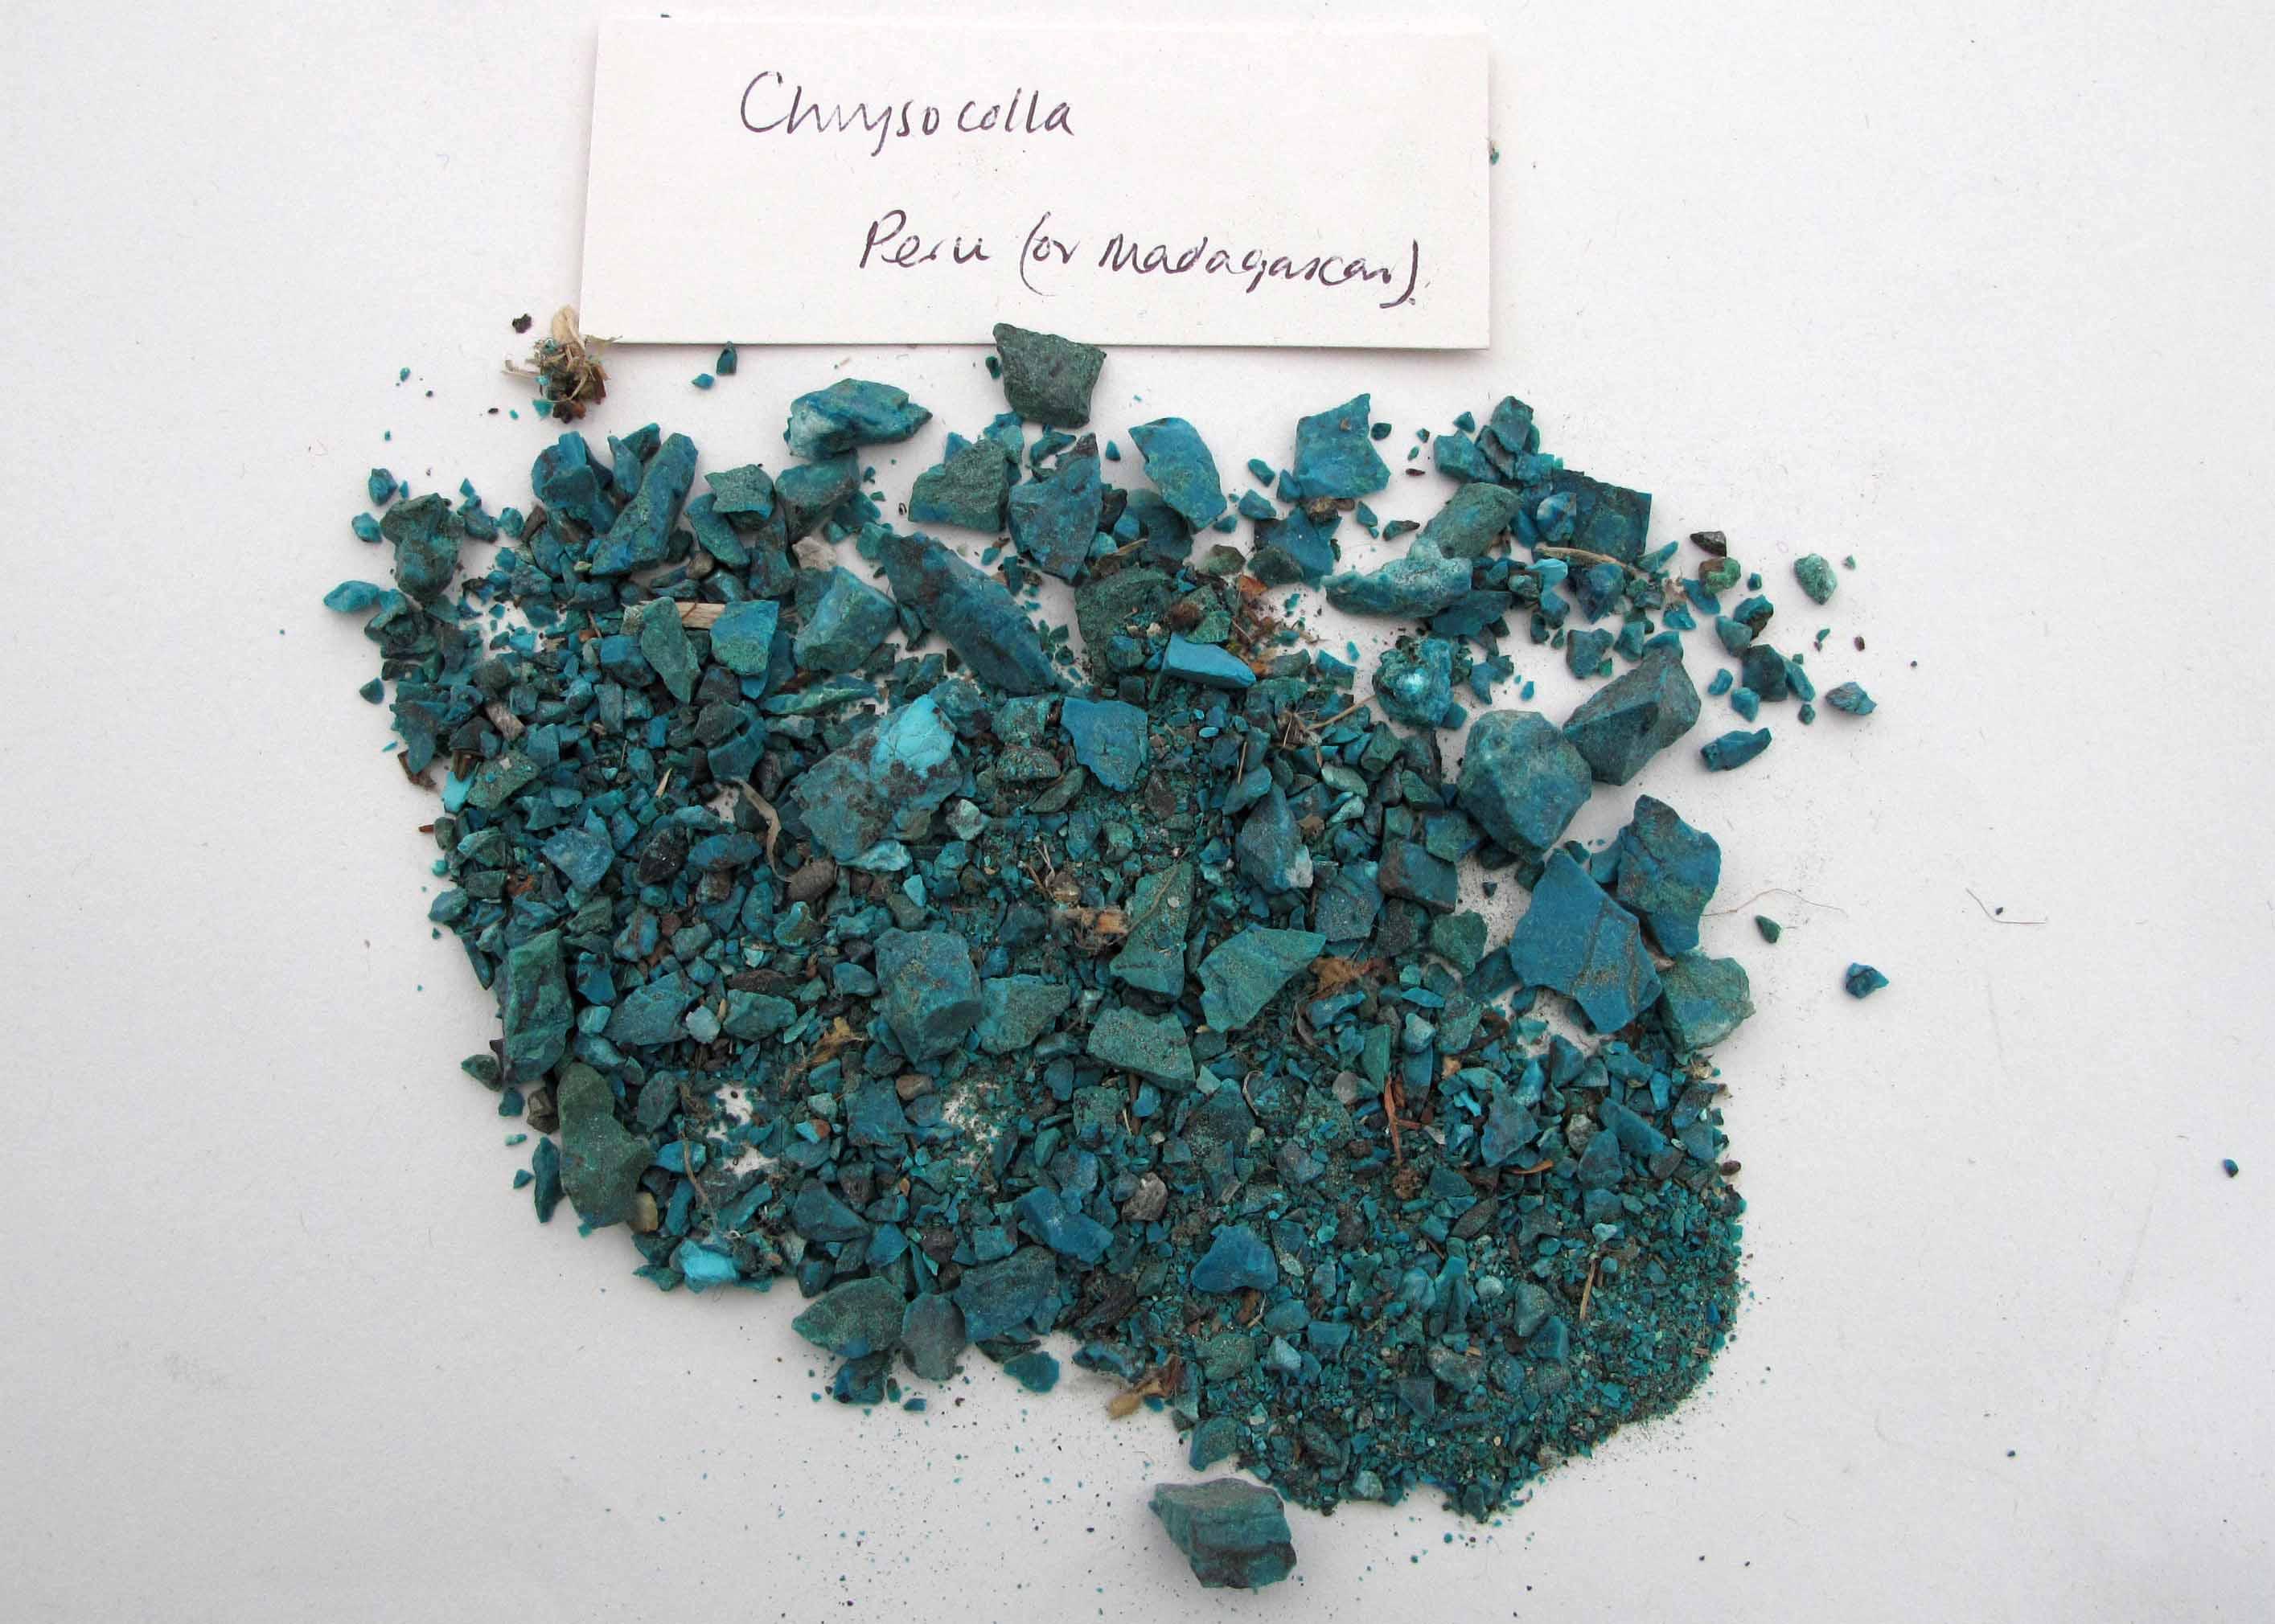 1 Chrysocolla rough stones